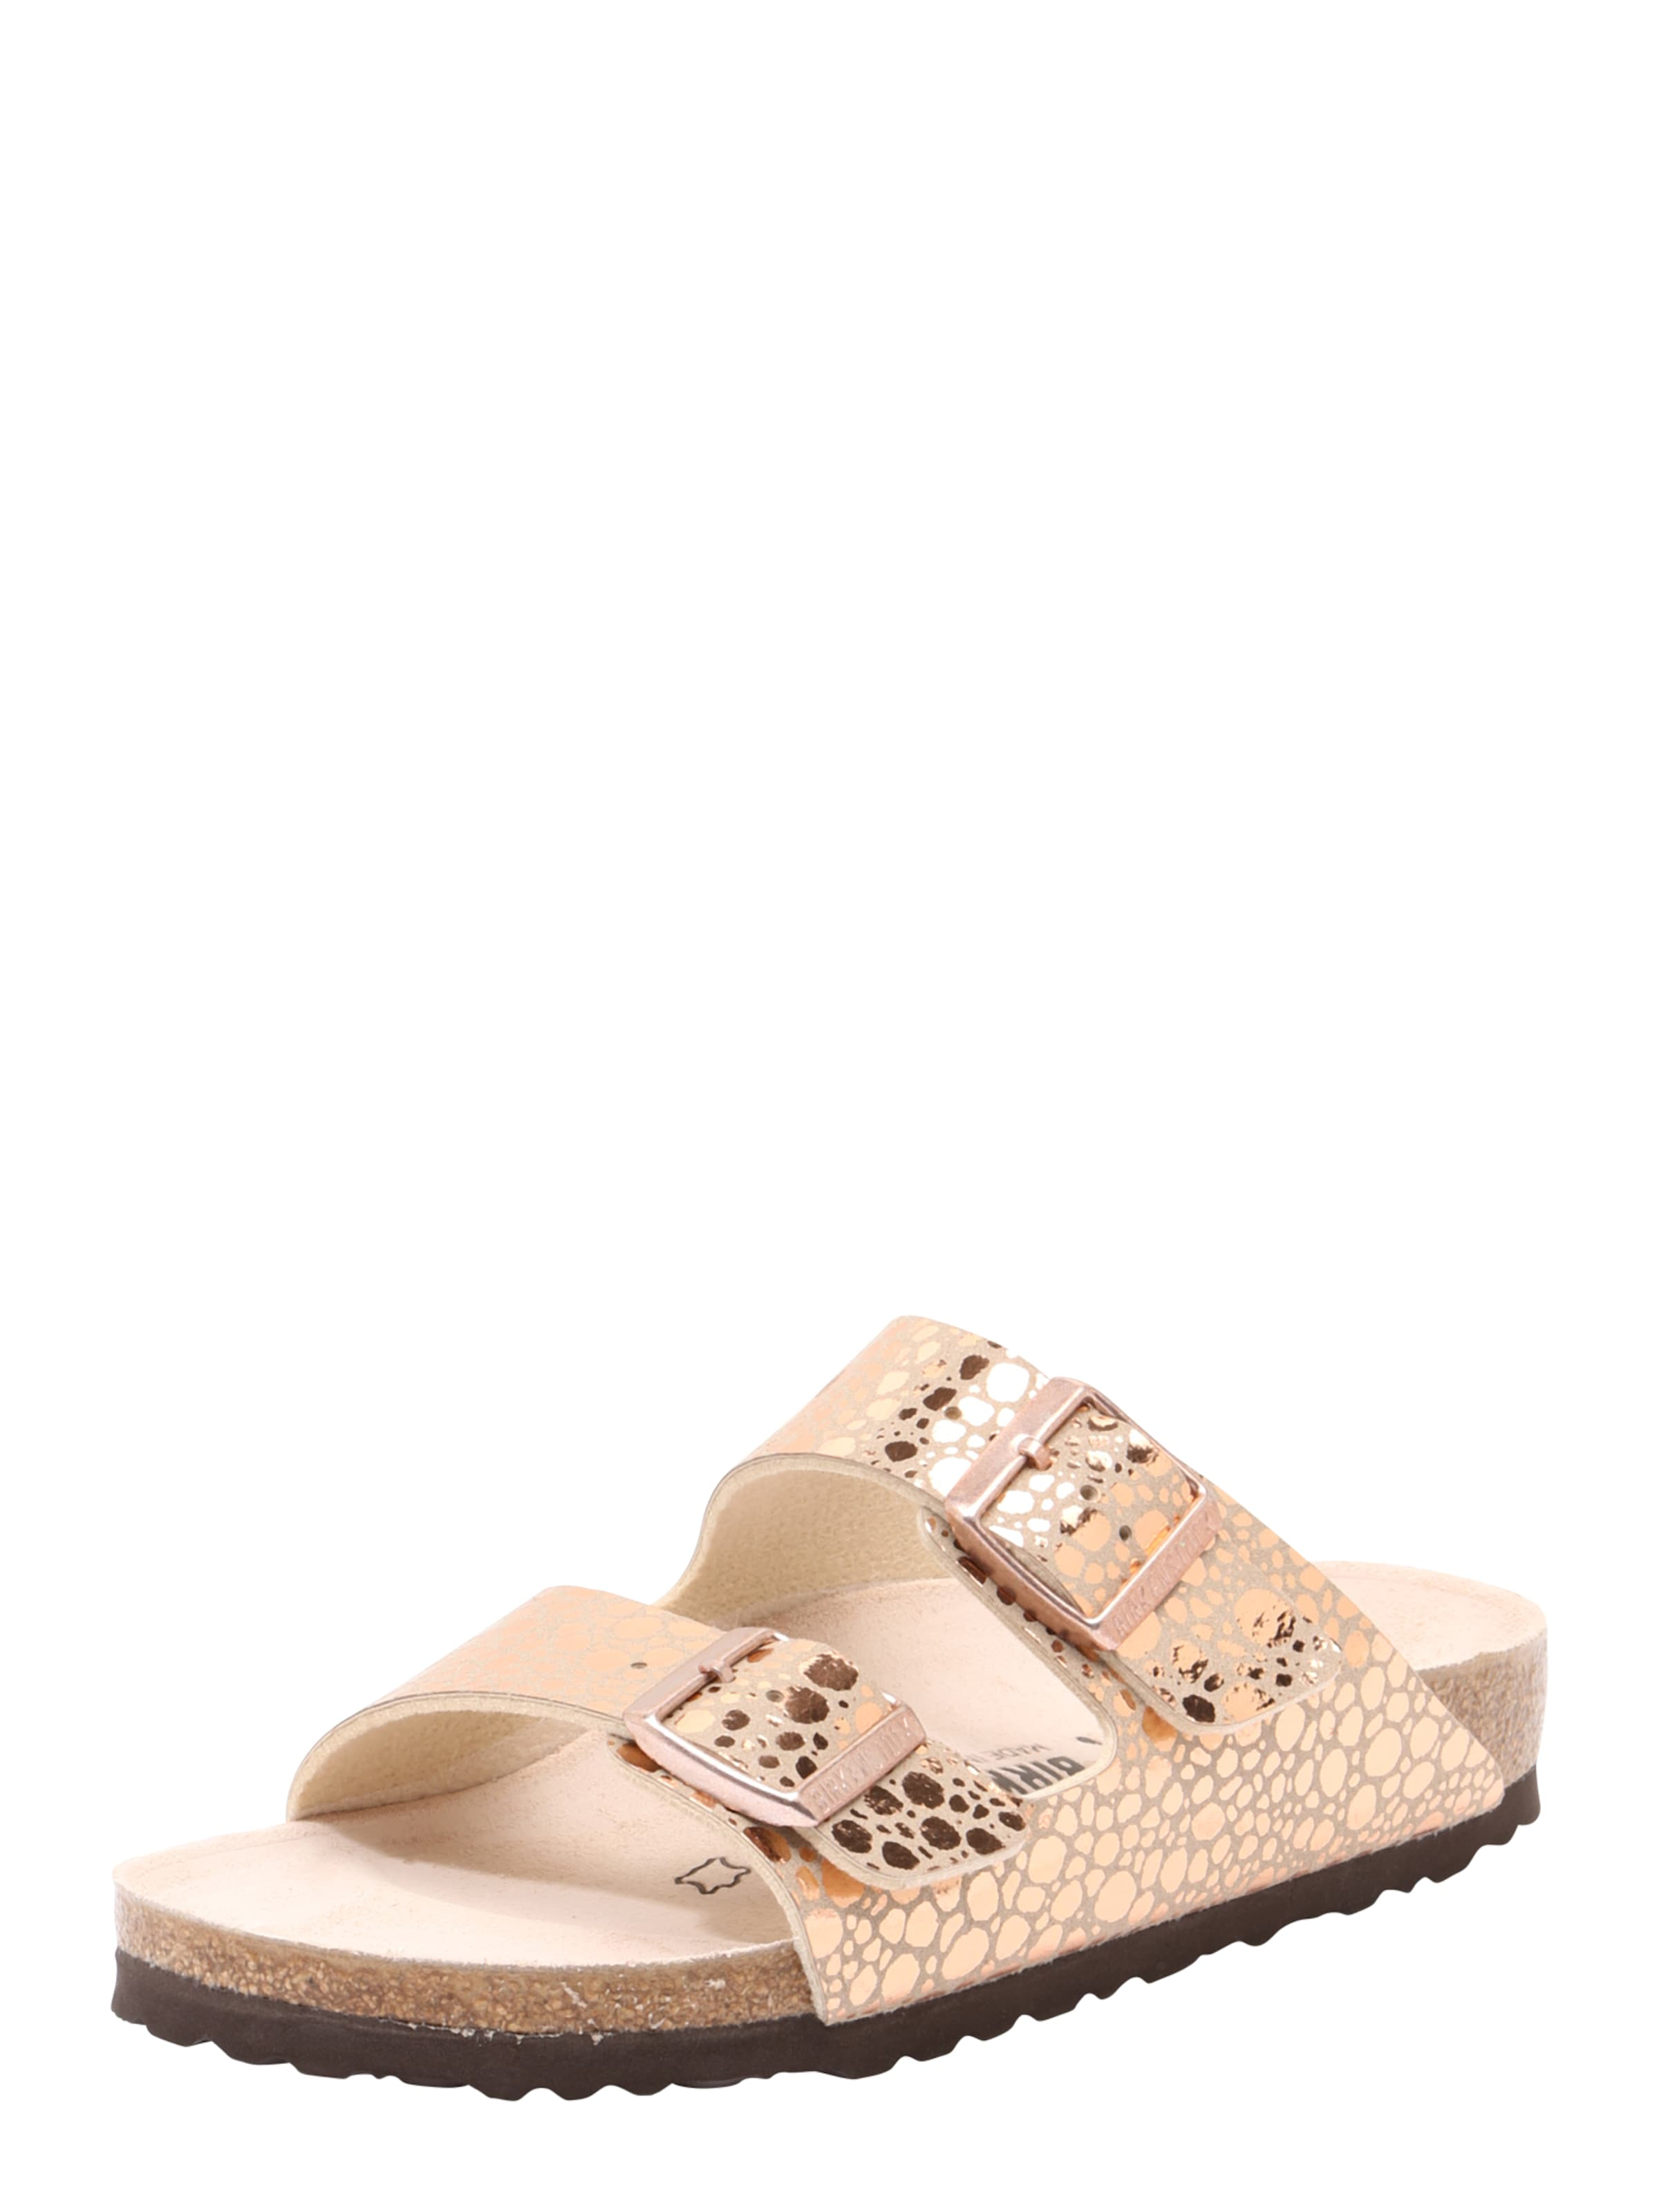 BIRKENSTOCK Sandalette Arizona Verschleißfeste billige Schuhe